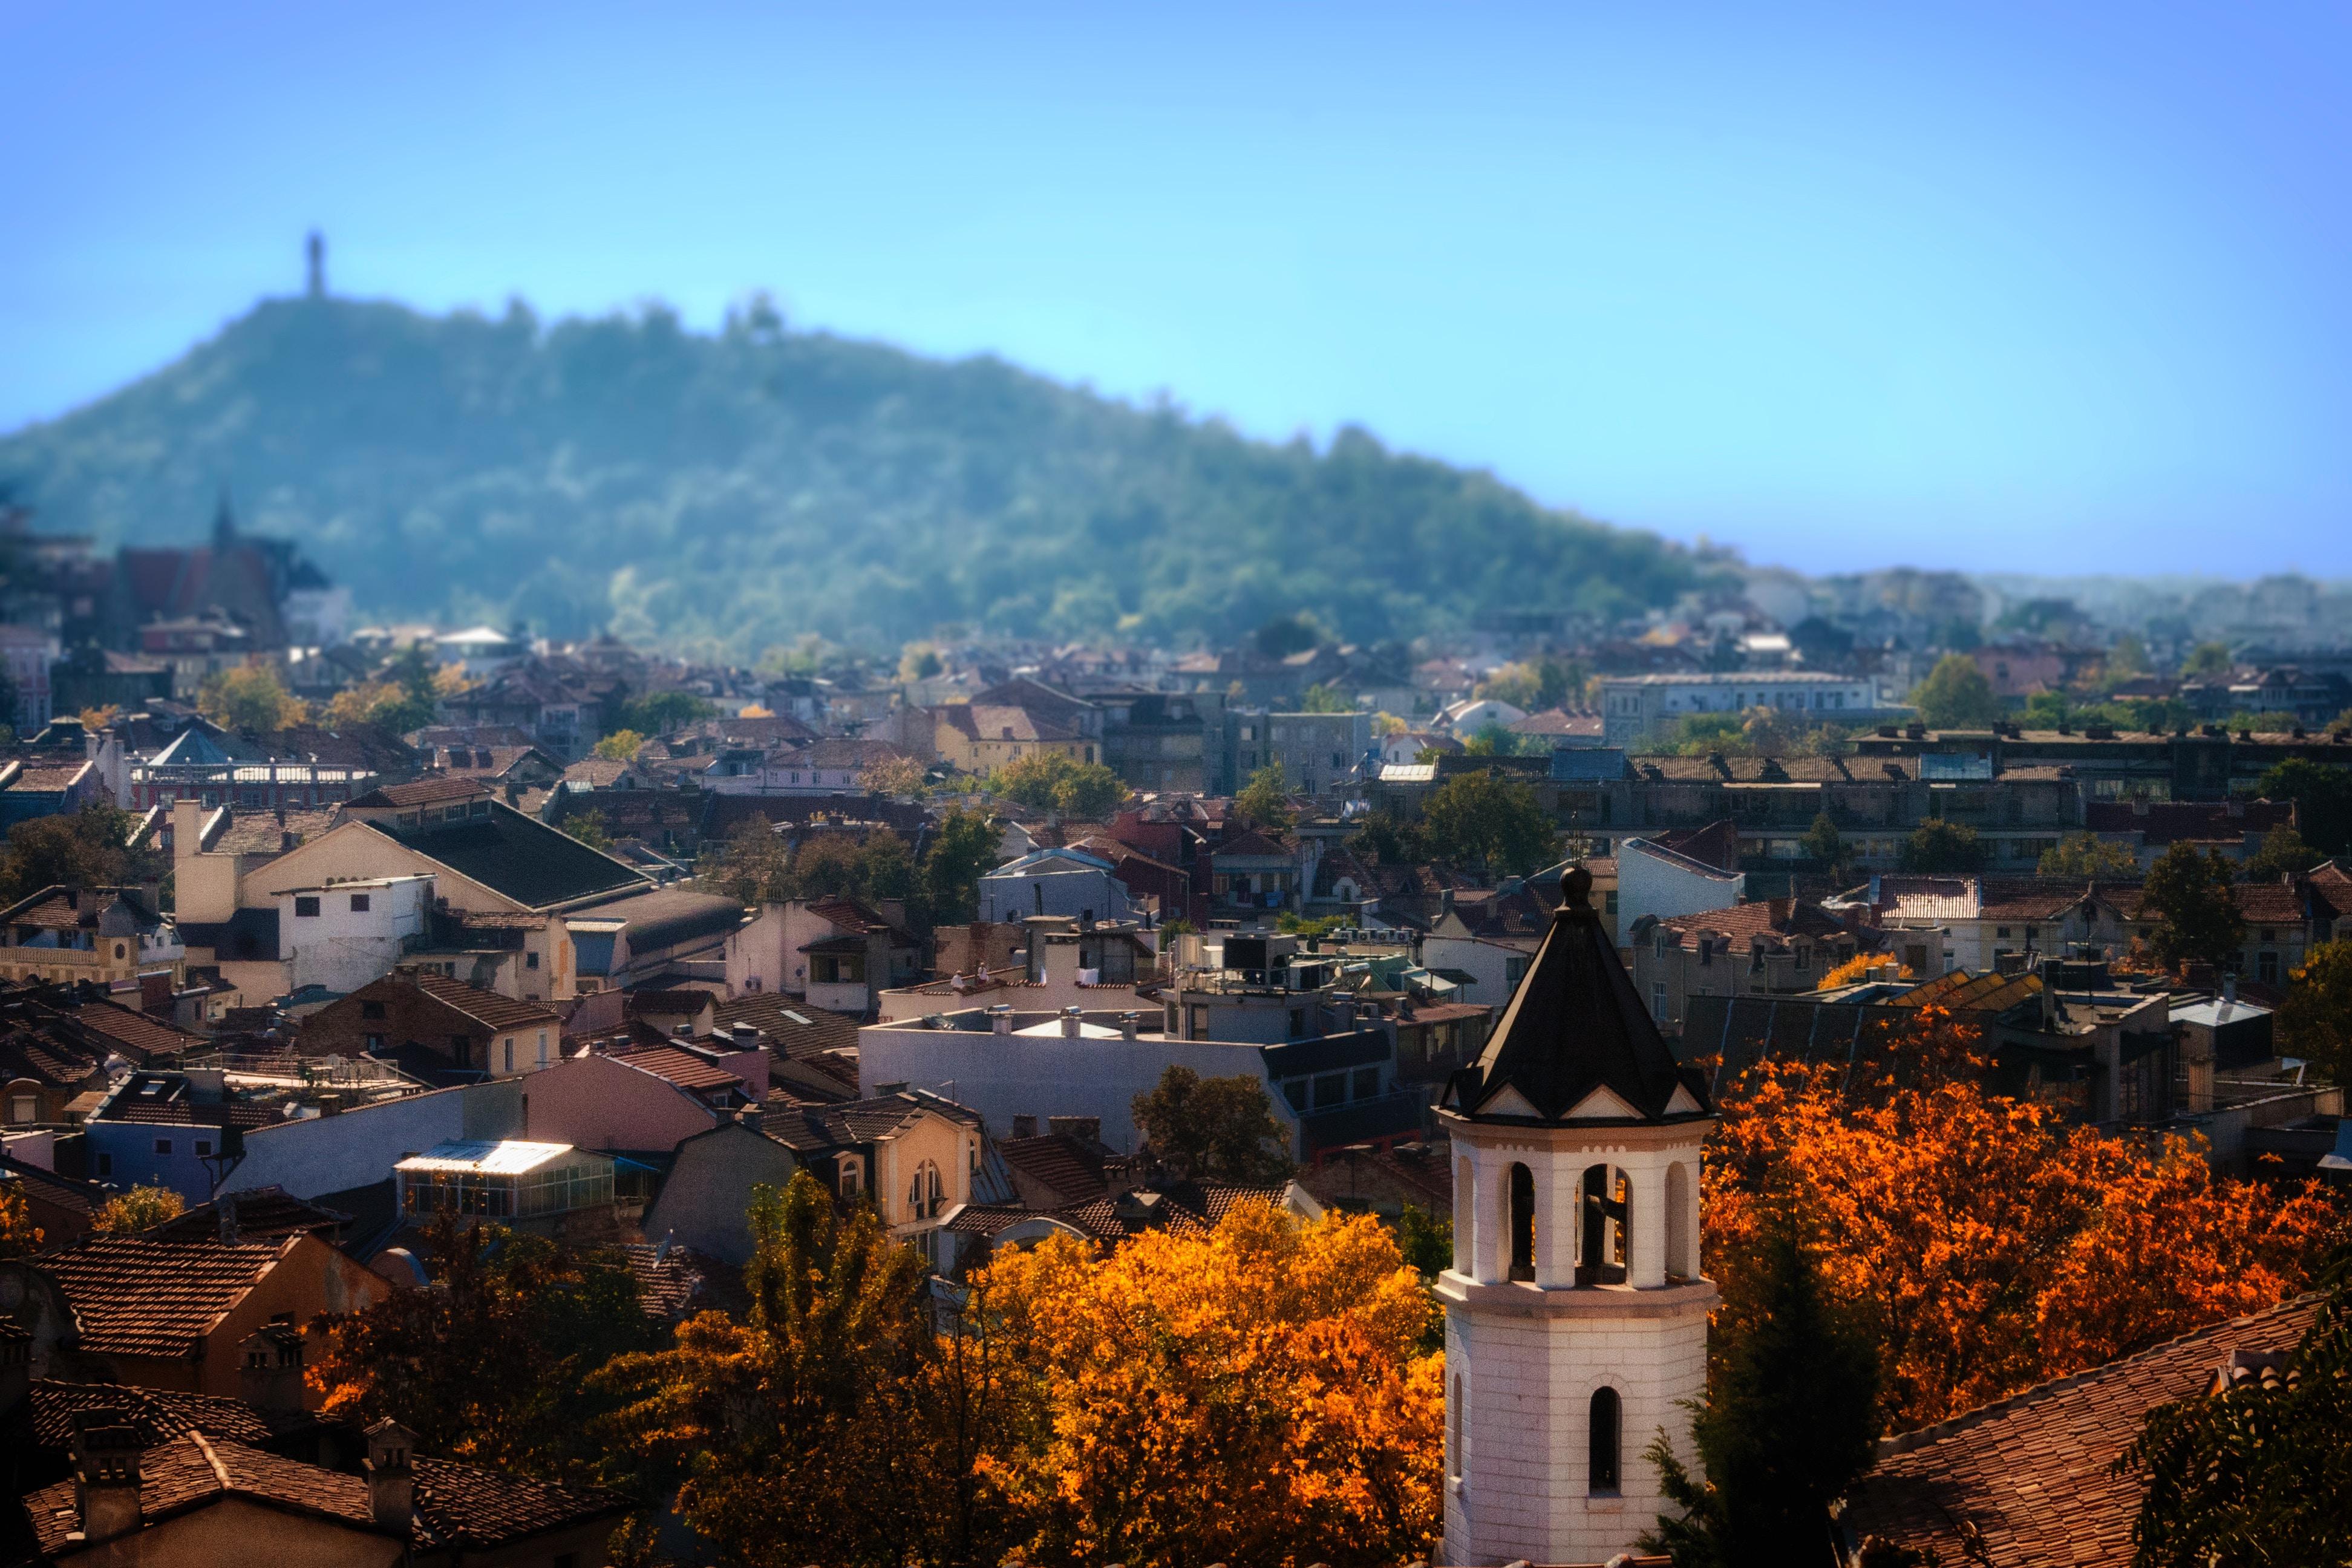 Bulgarie : traditions, mer et montagnes N°2